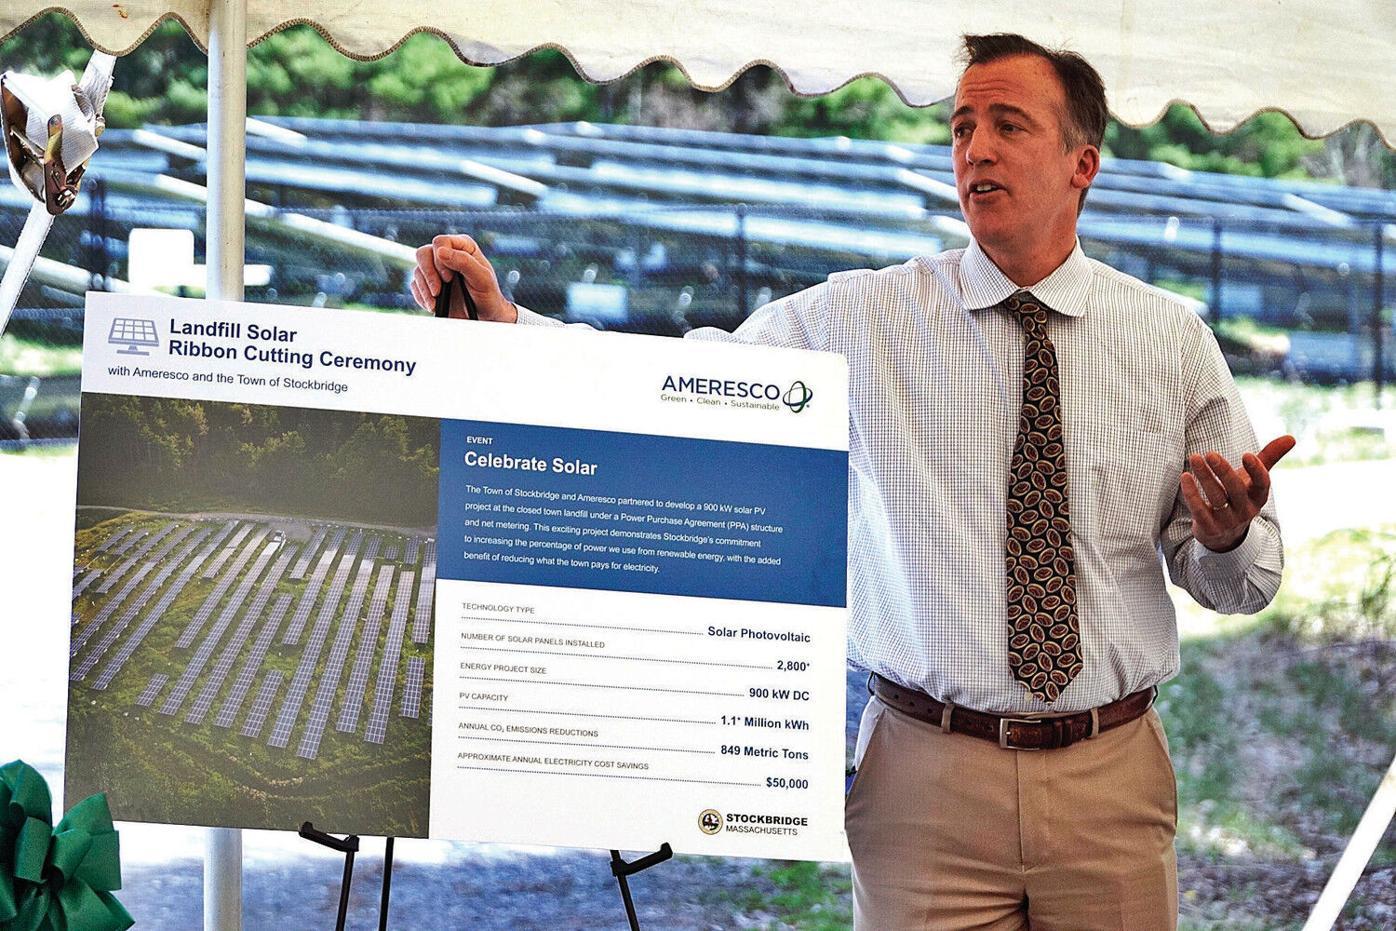 Light, panels, action: Stockbridge celebrates its new 900-kW solar array